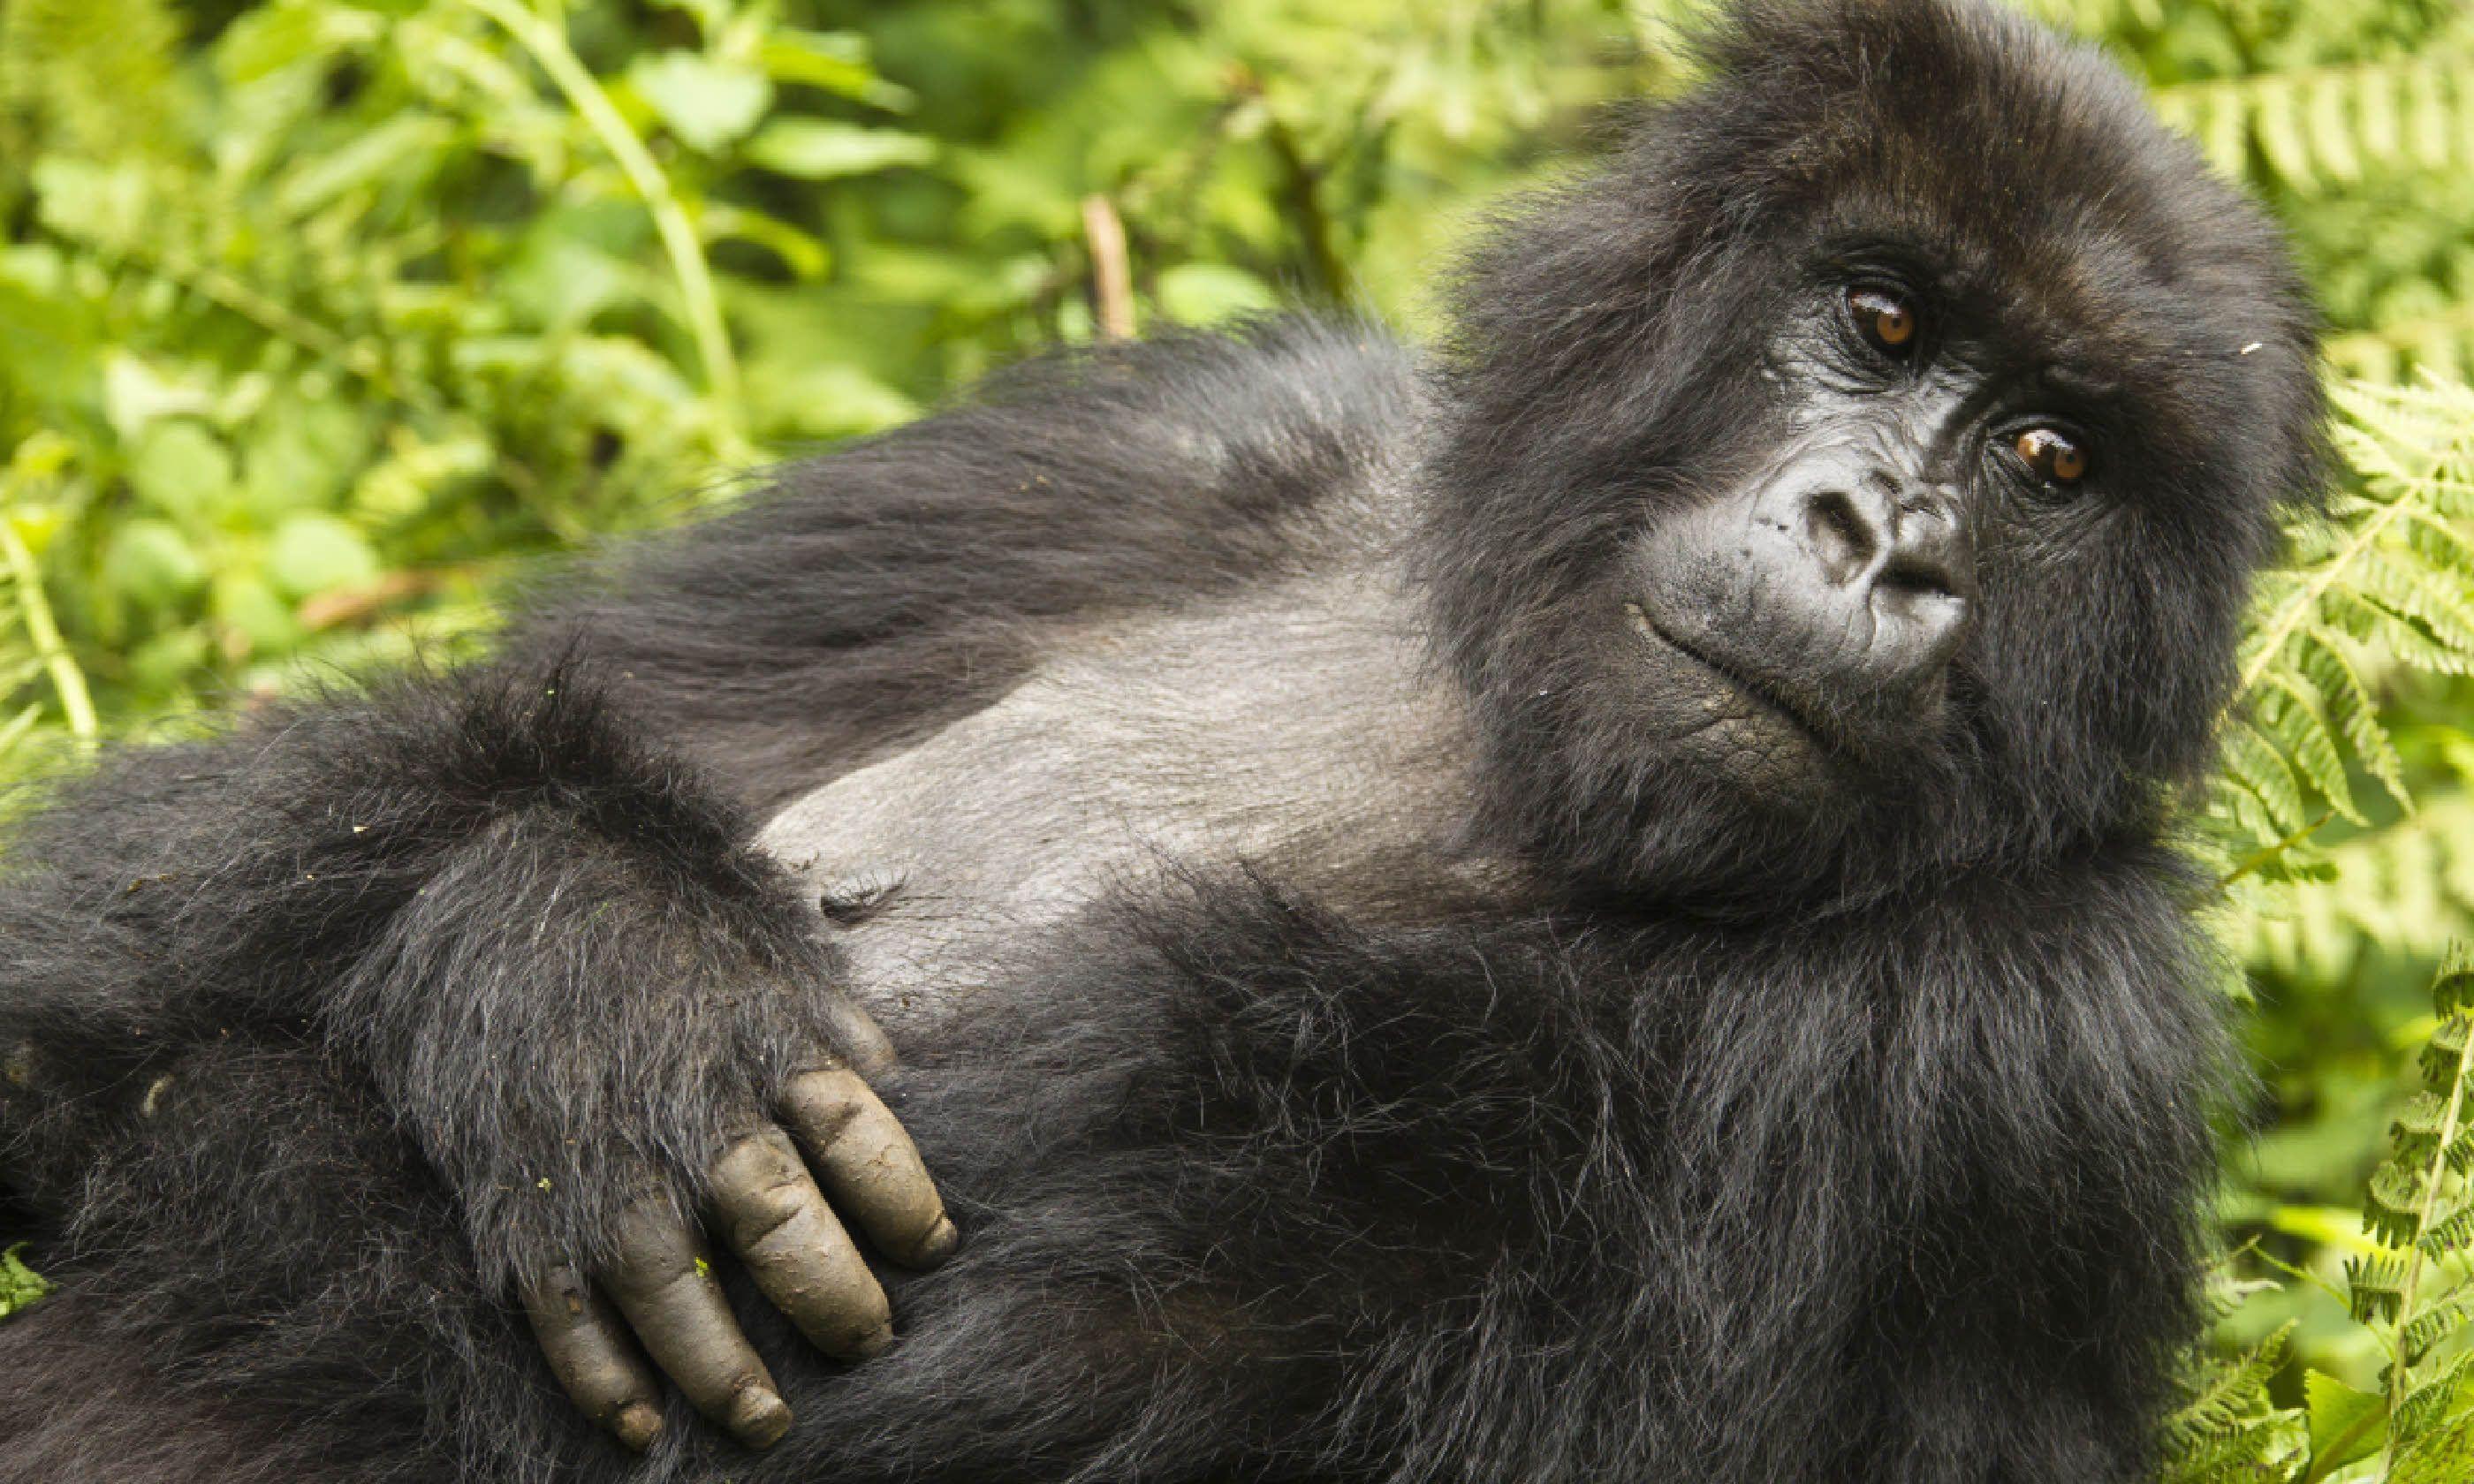 Umubamo Group mountain gorilla, Volcanoes National Park, Rwanda (Shutterstock)